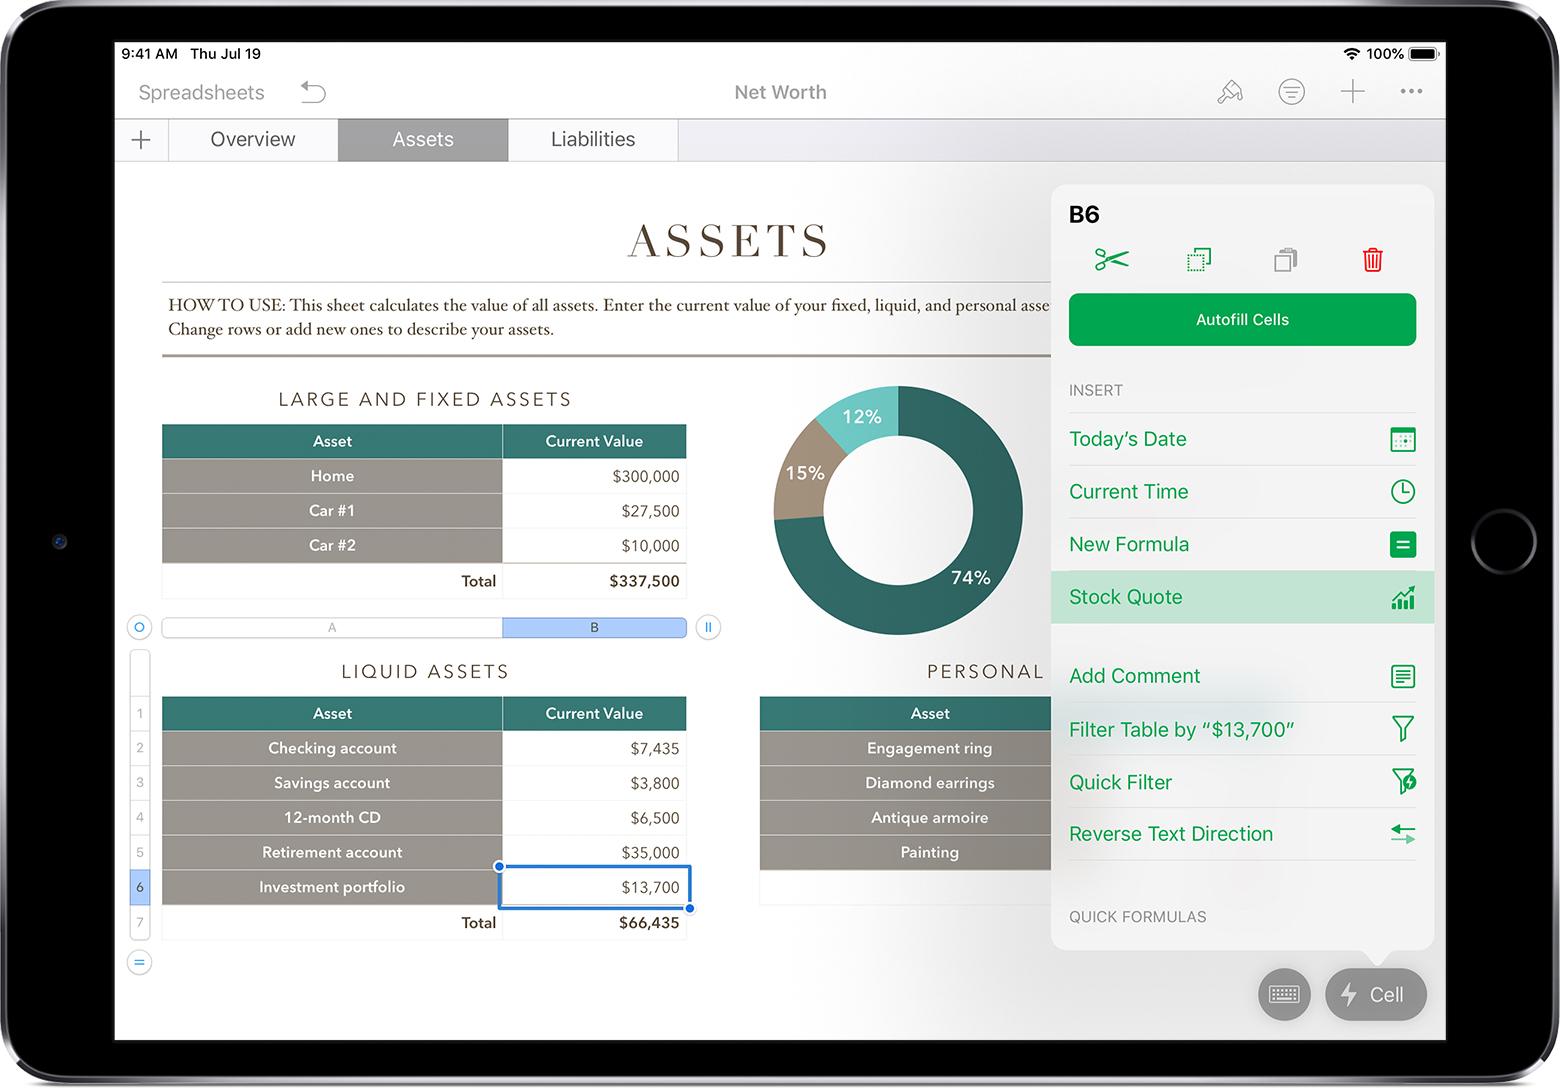 Apple Spreadsheet App For Ipad Spreadsheet Downloa Apple